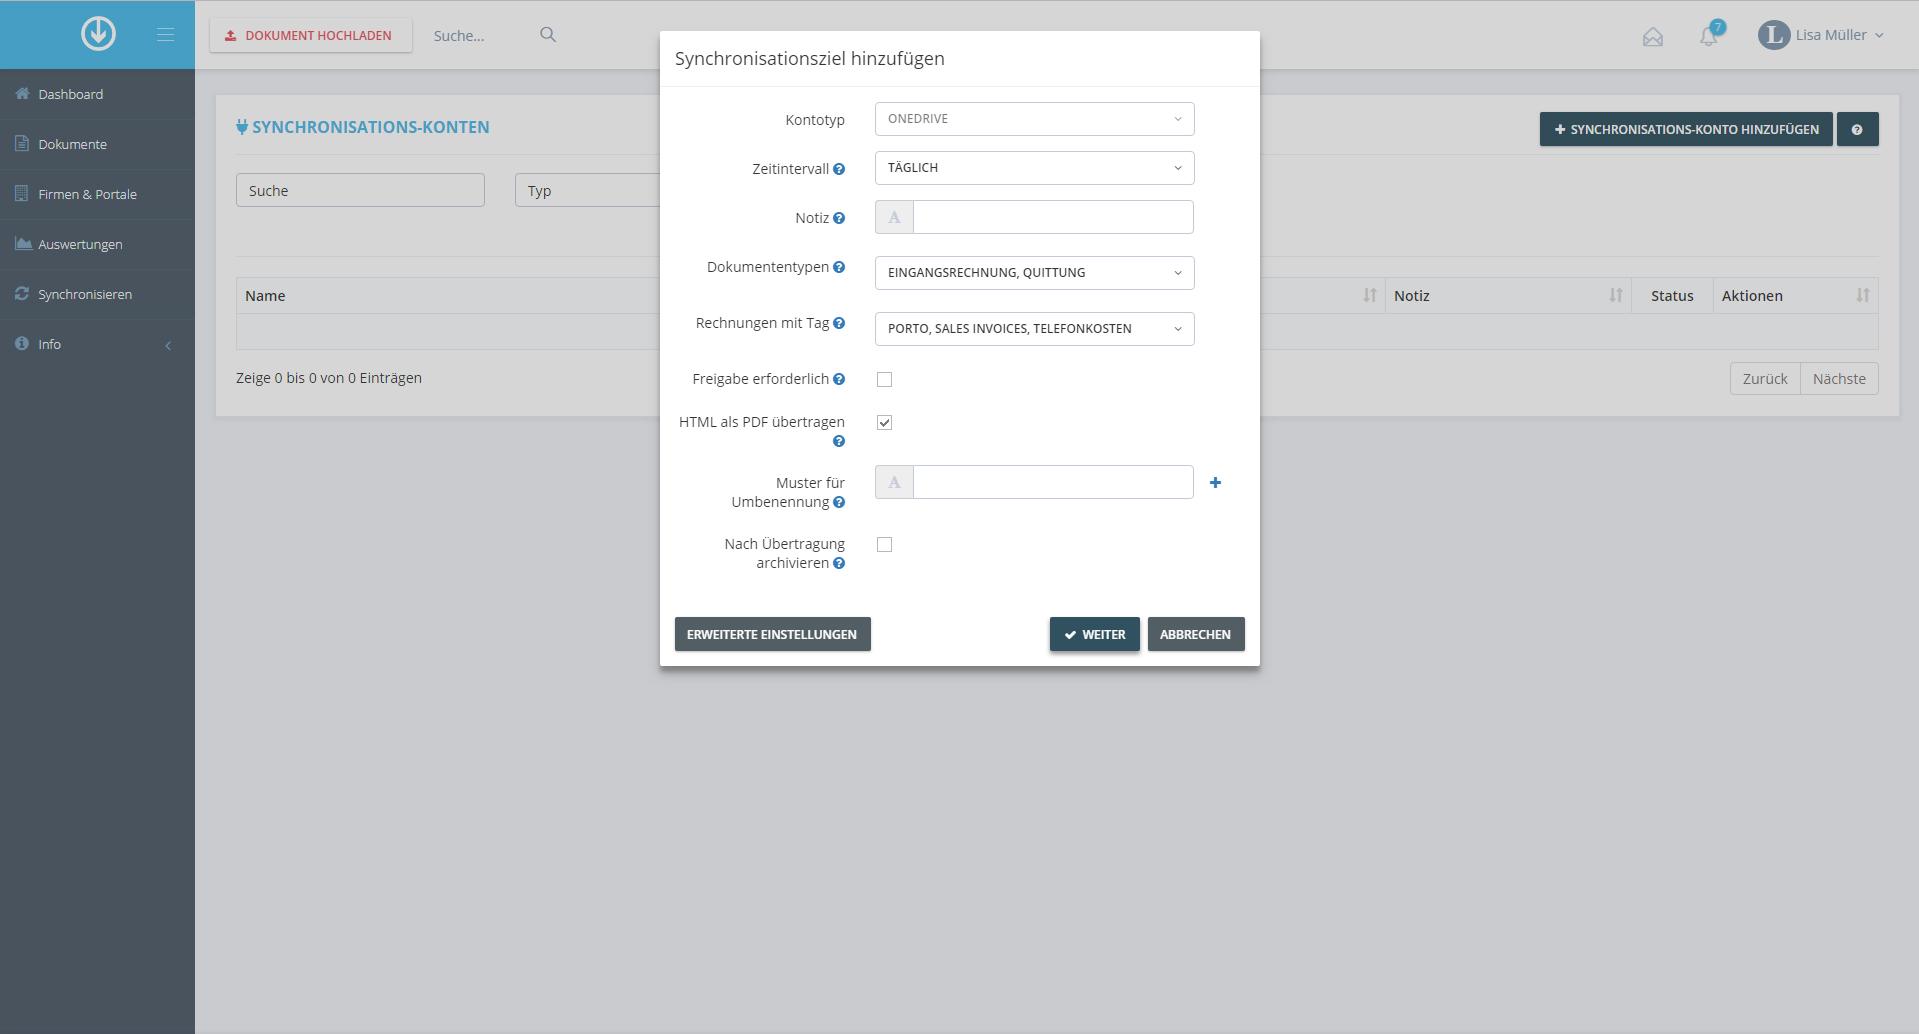 2. Dokumentenexport: Synchronisationsziel hinzufügen